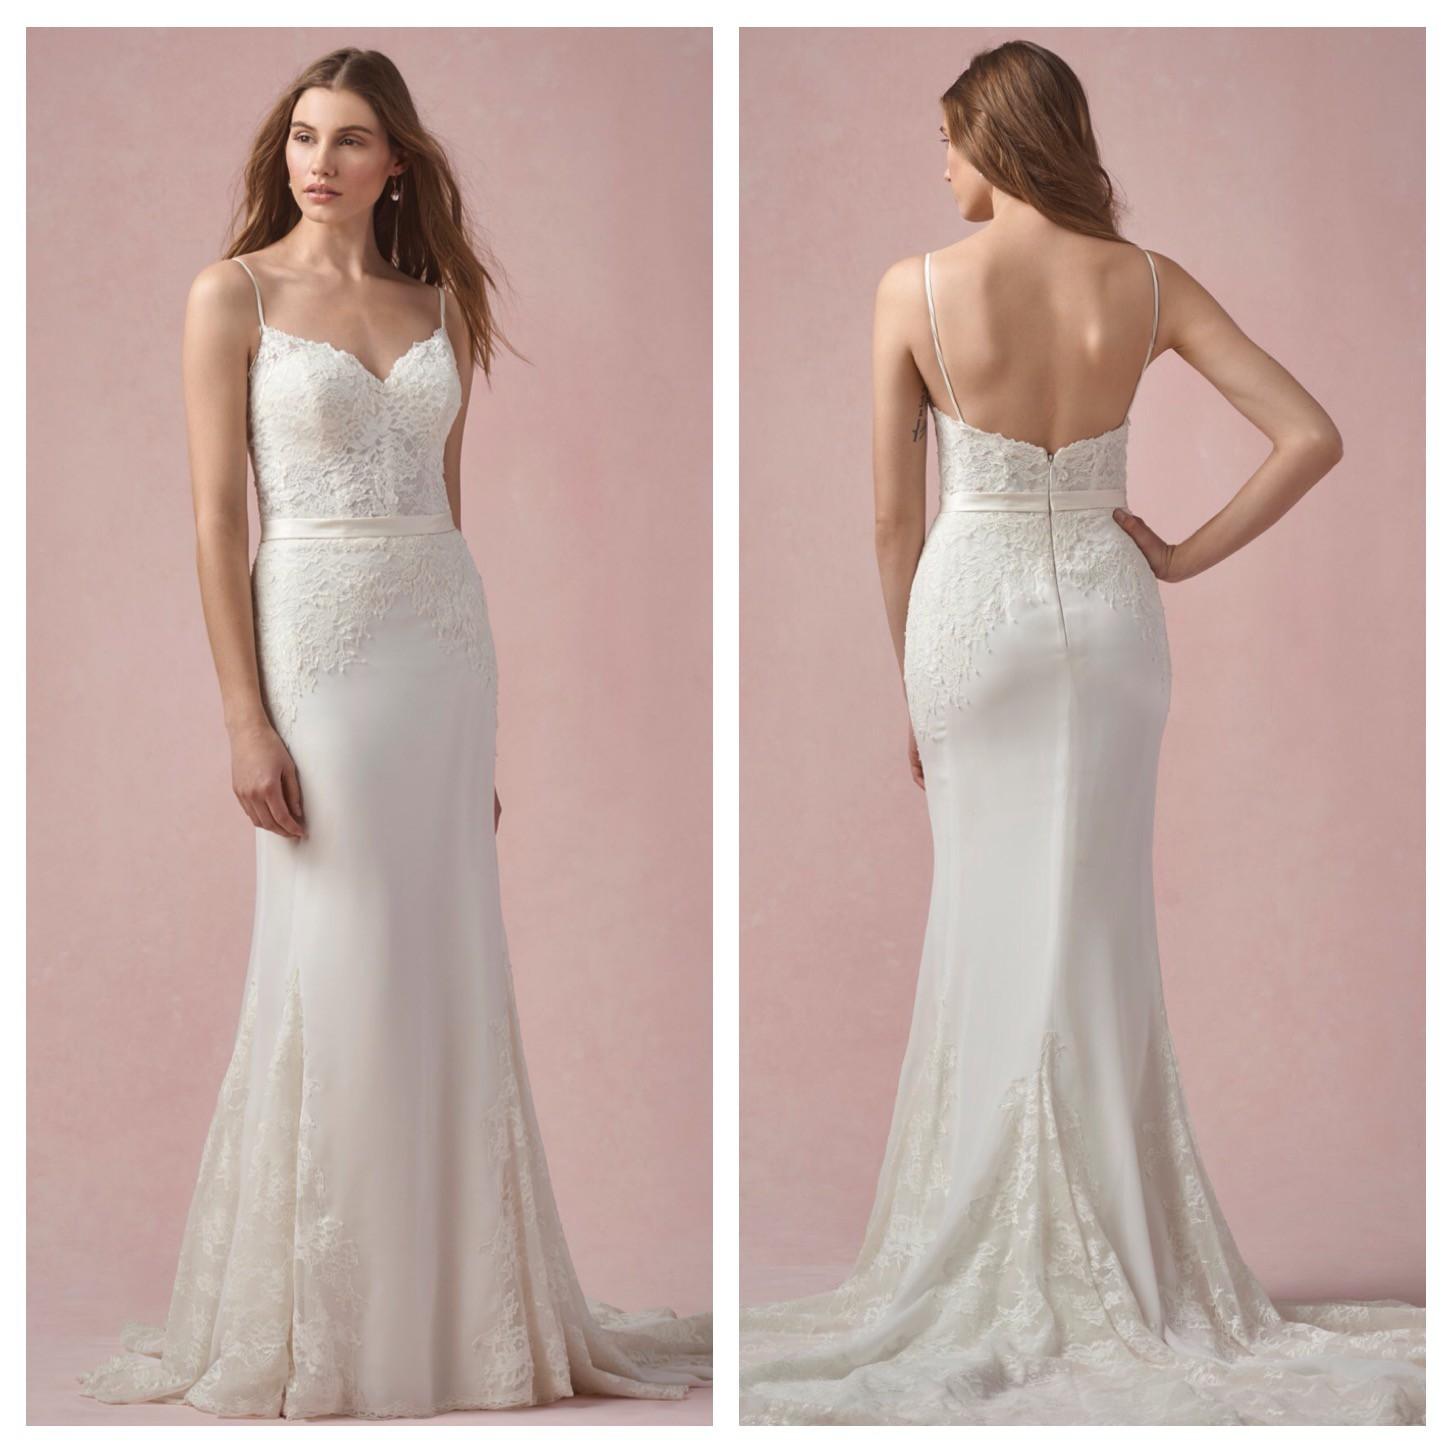 53 Wedding Dress : Watters katy wedding dress on sale off